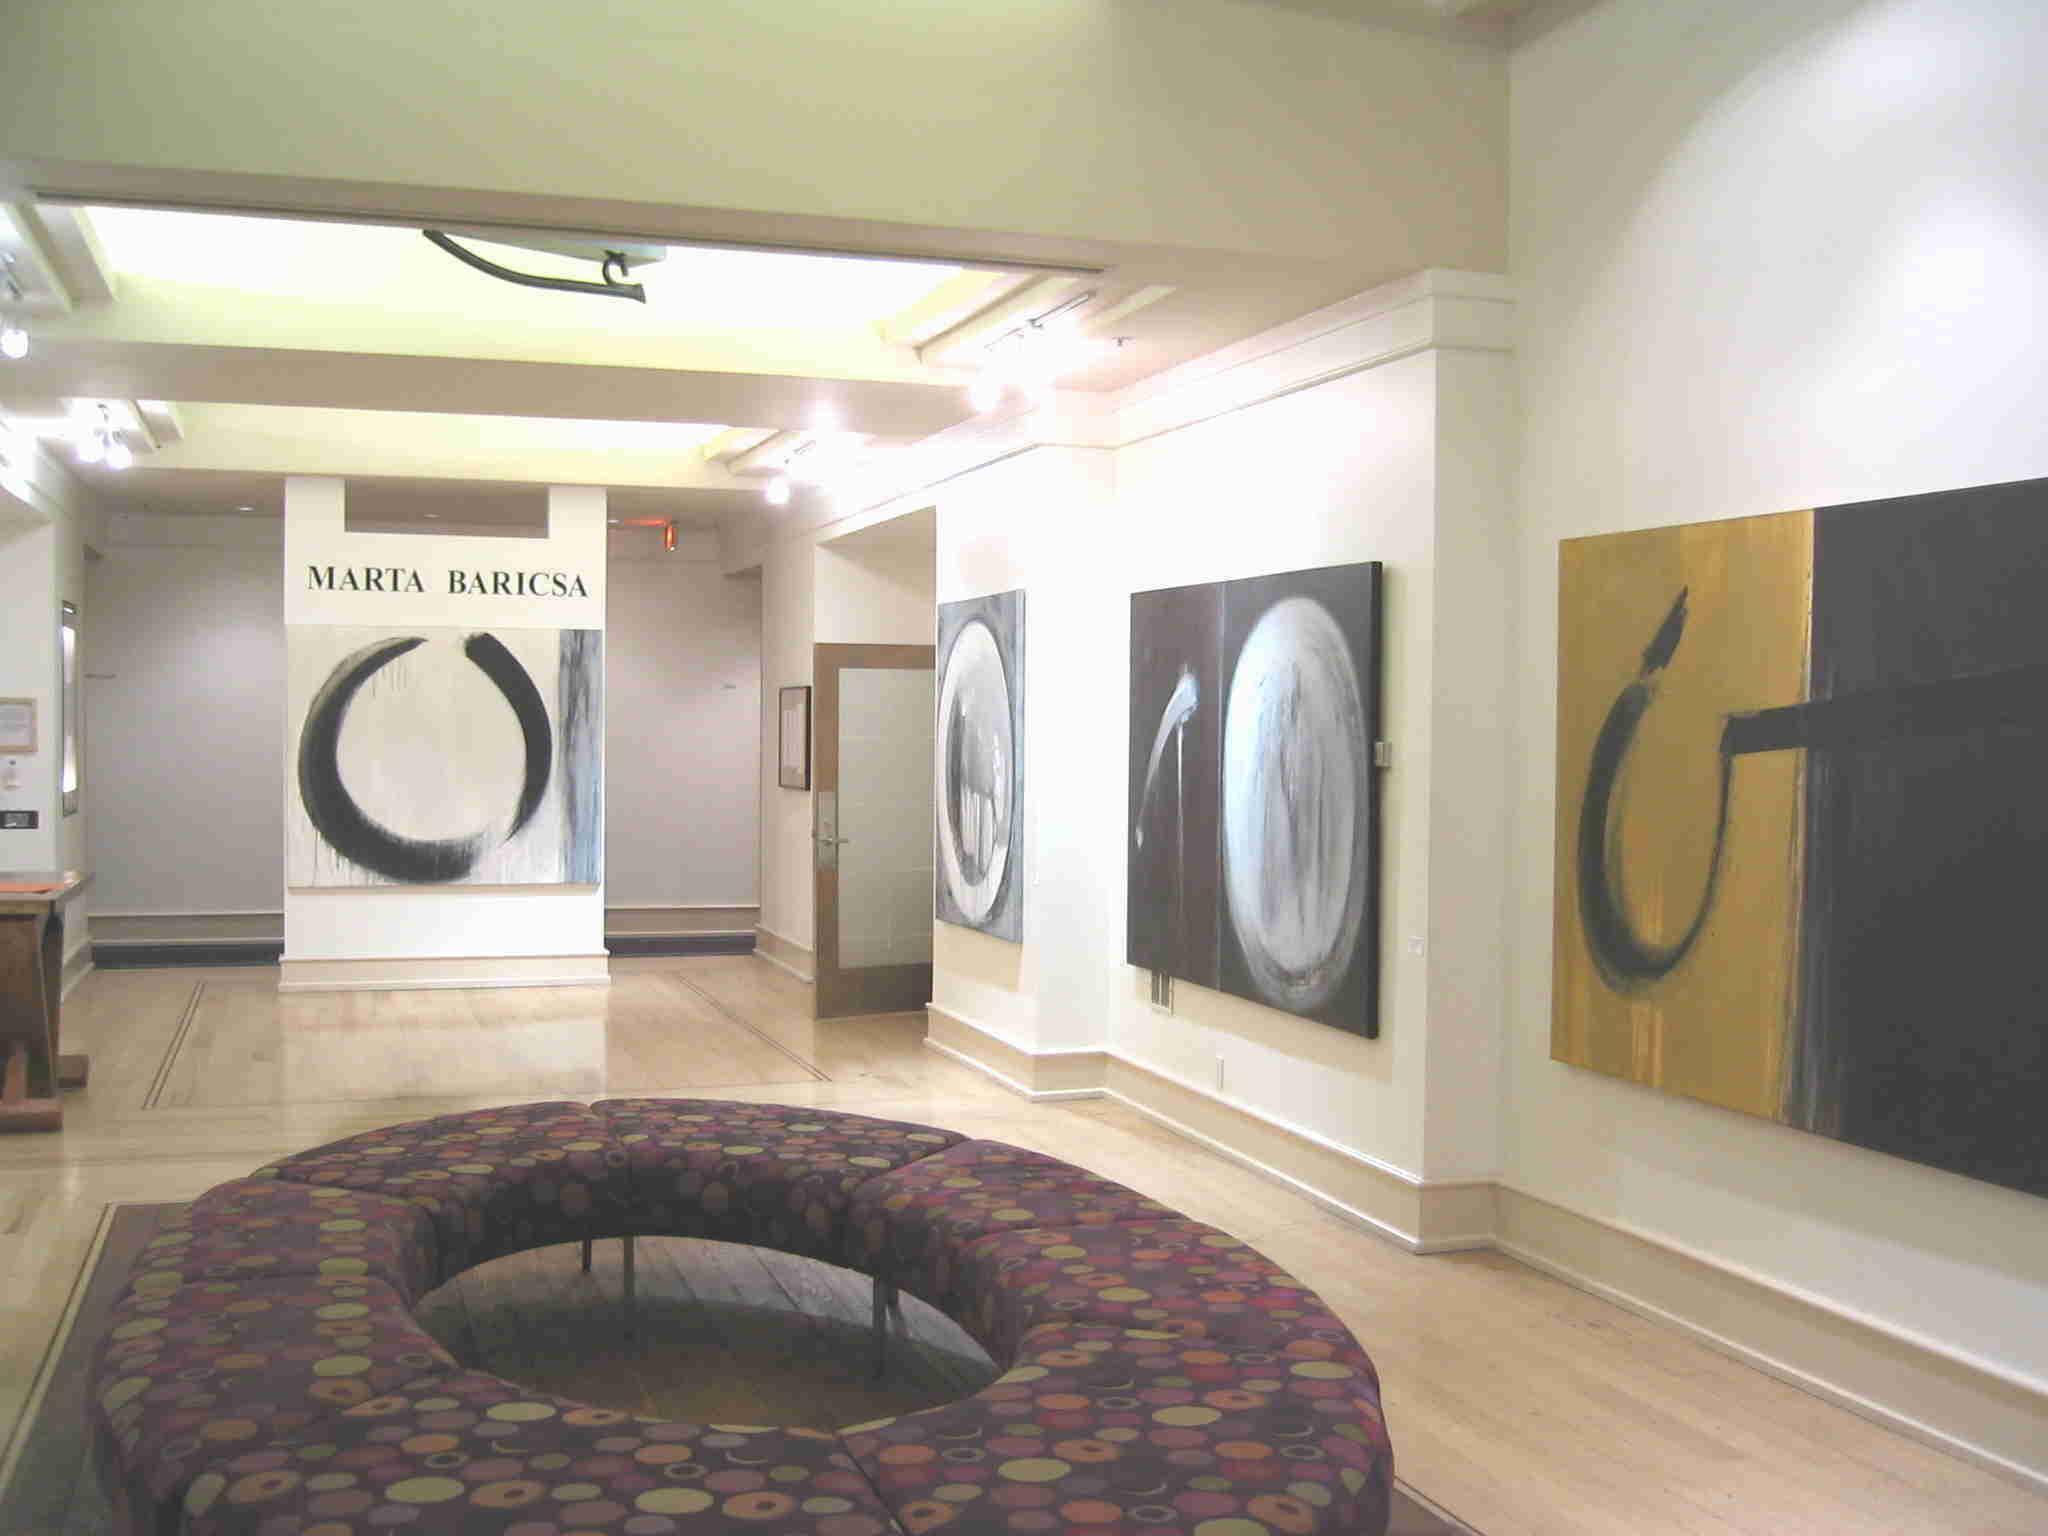 Marta Baricsa exhibition